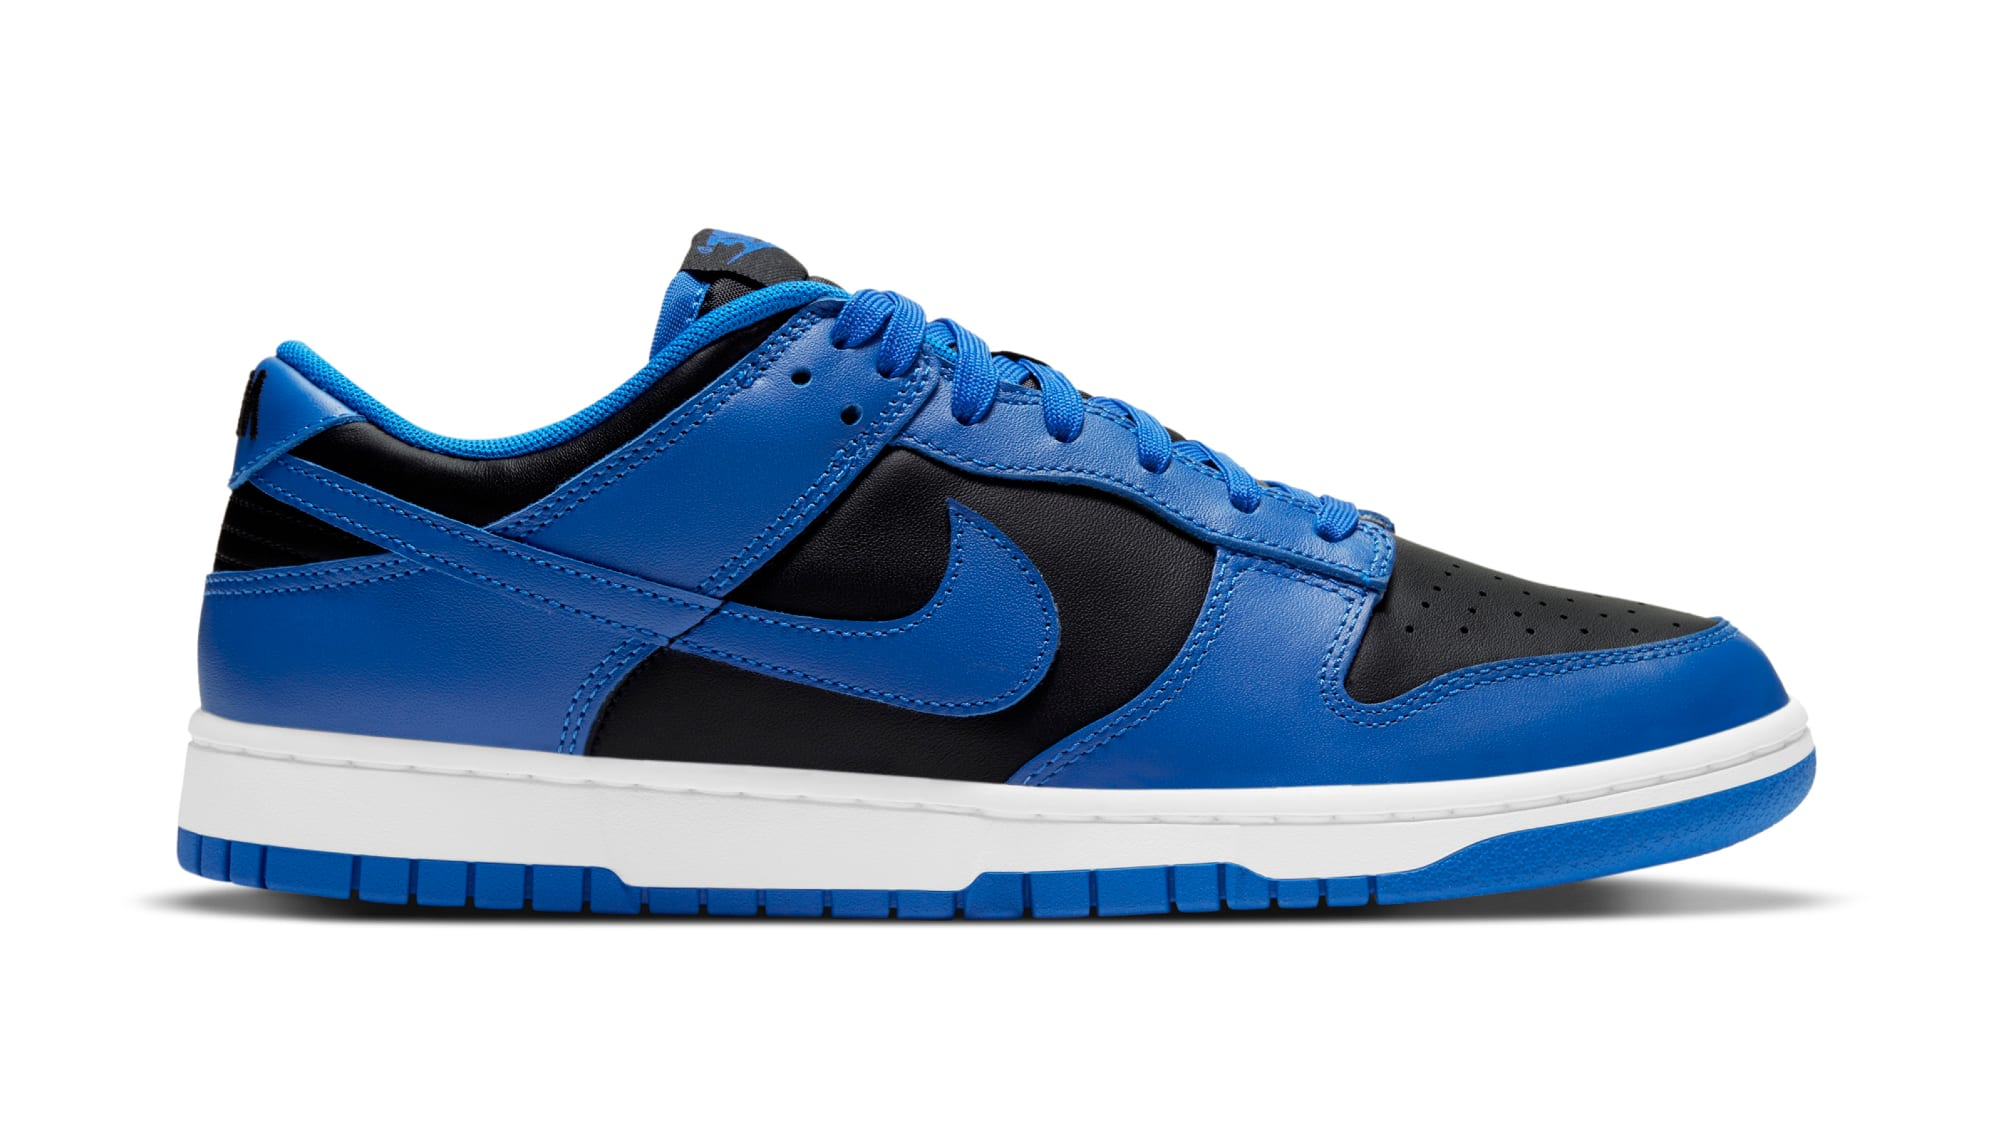 Nike Dunk Low 'Hyper Cobalt' DD1391-001 Release Date